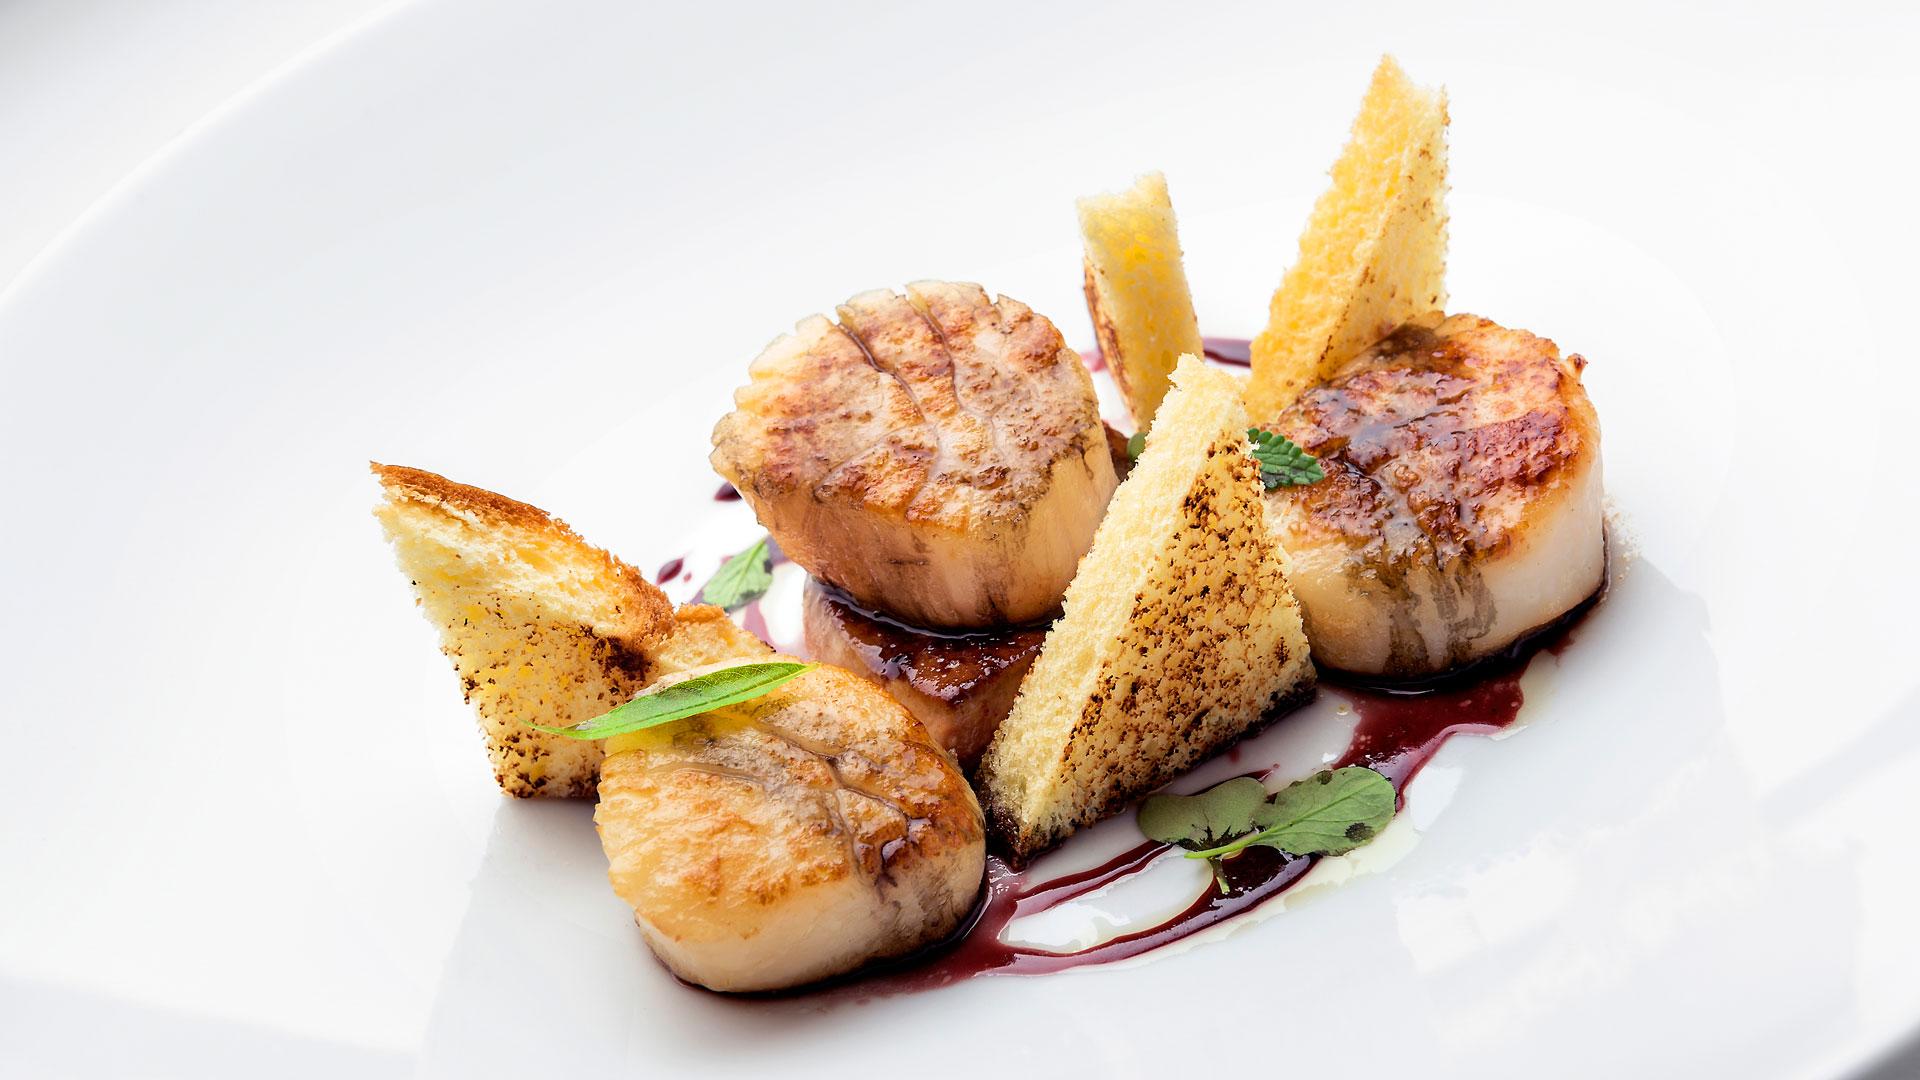 Menu Gourmet Febbraio 2020 La Sprelunga